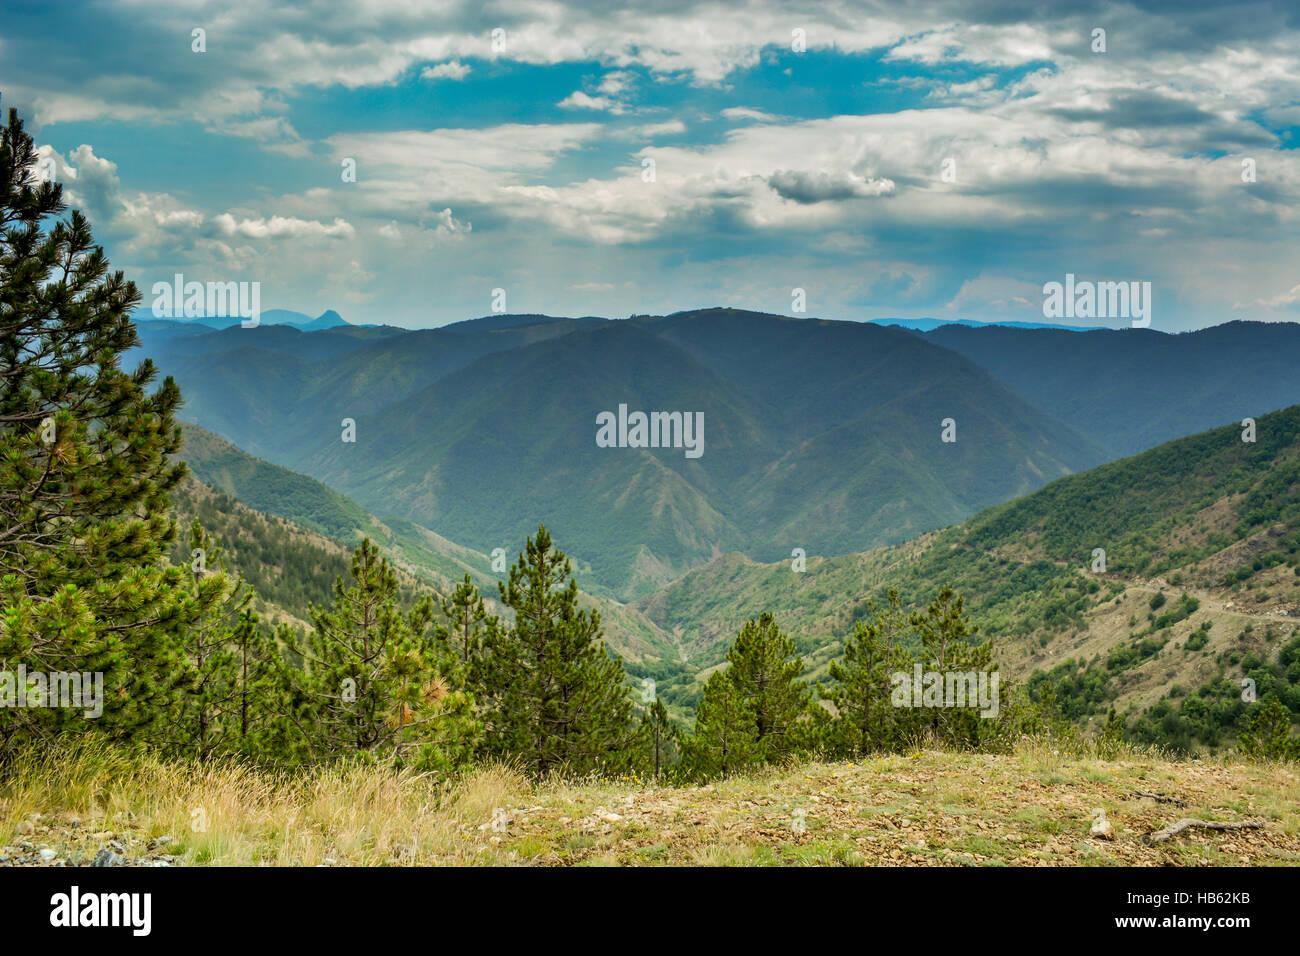 Mountain horizons - Stock Image